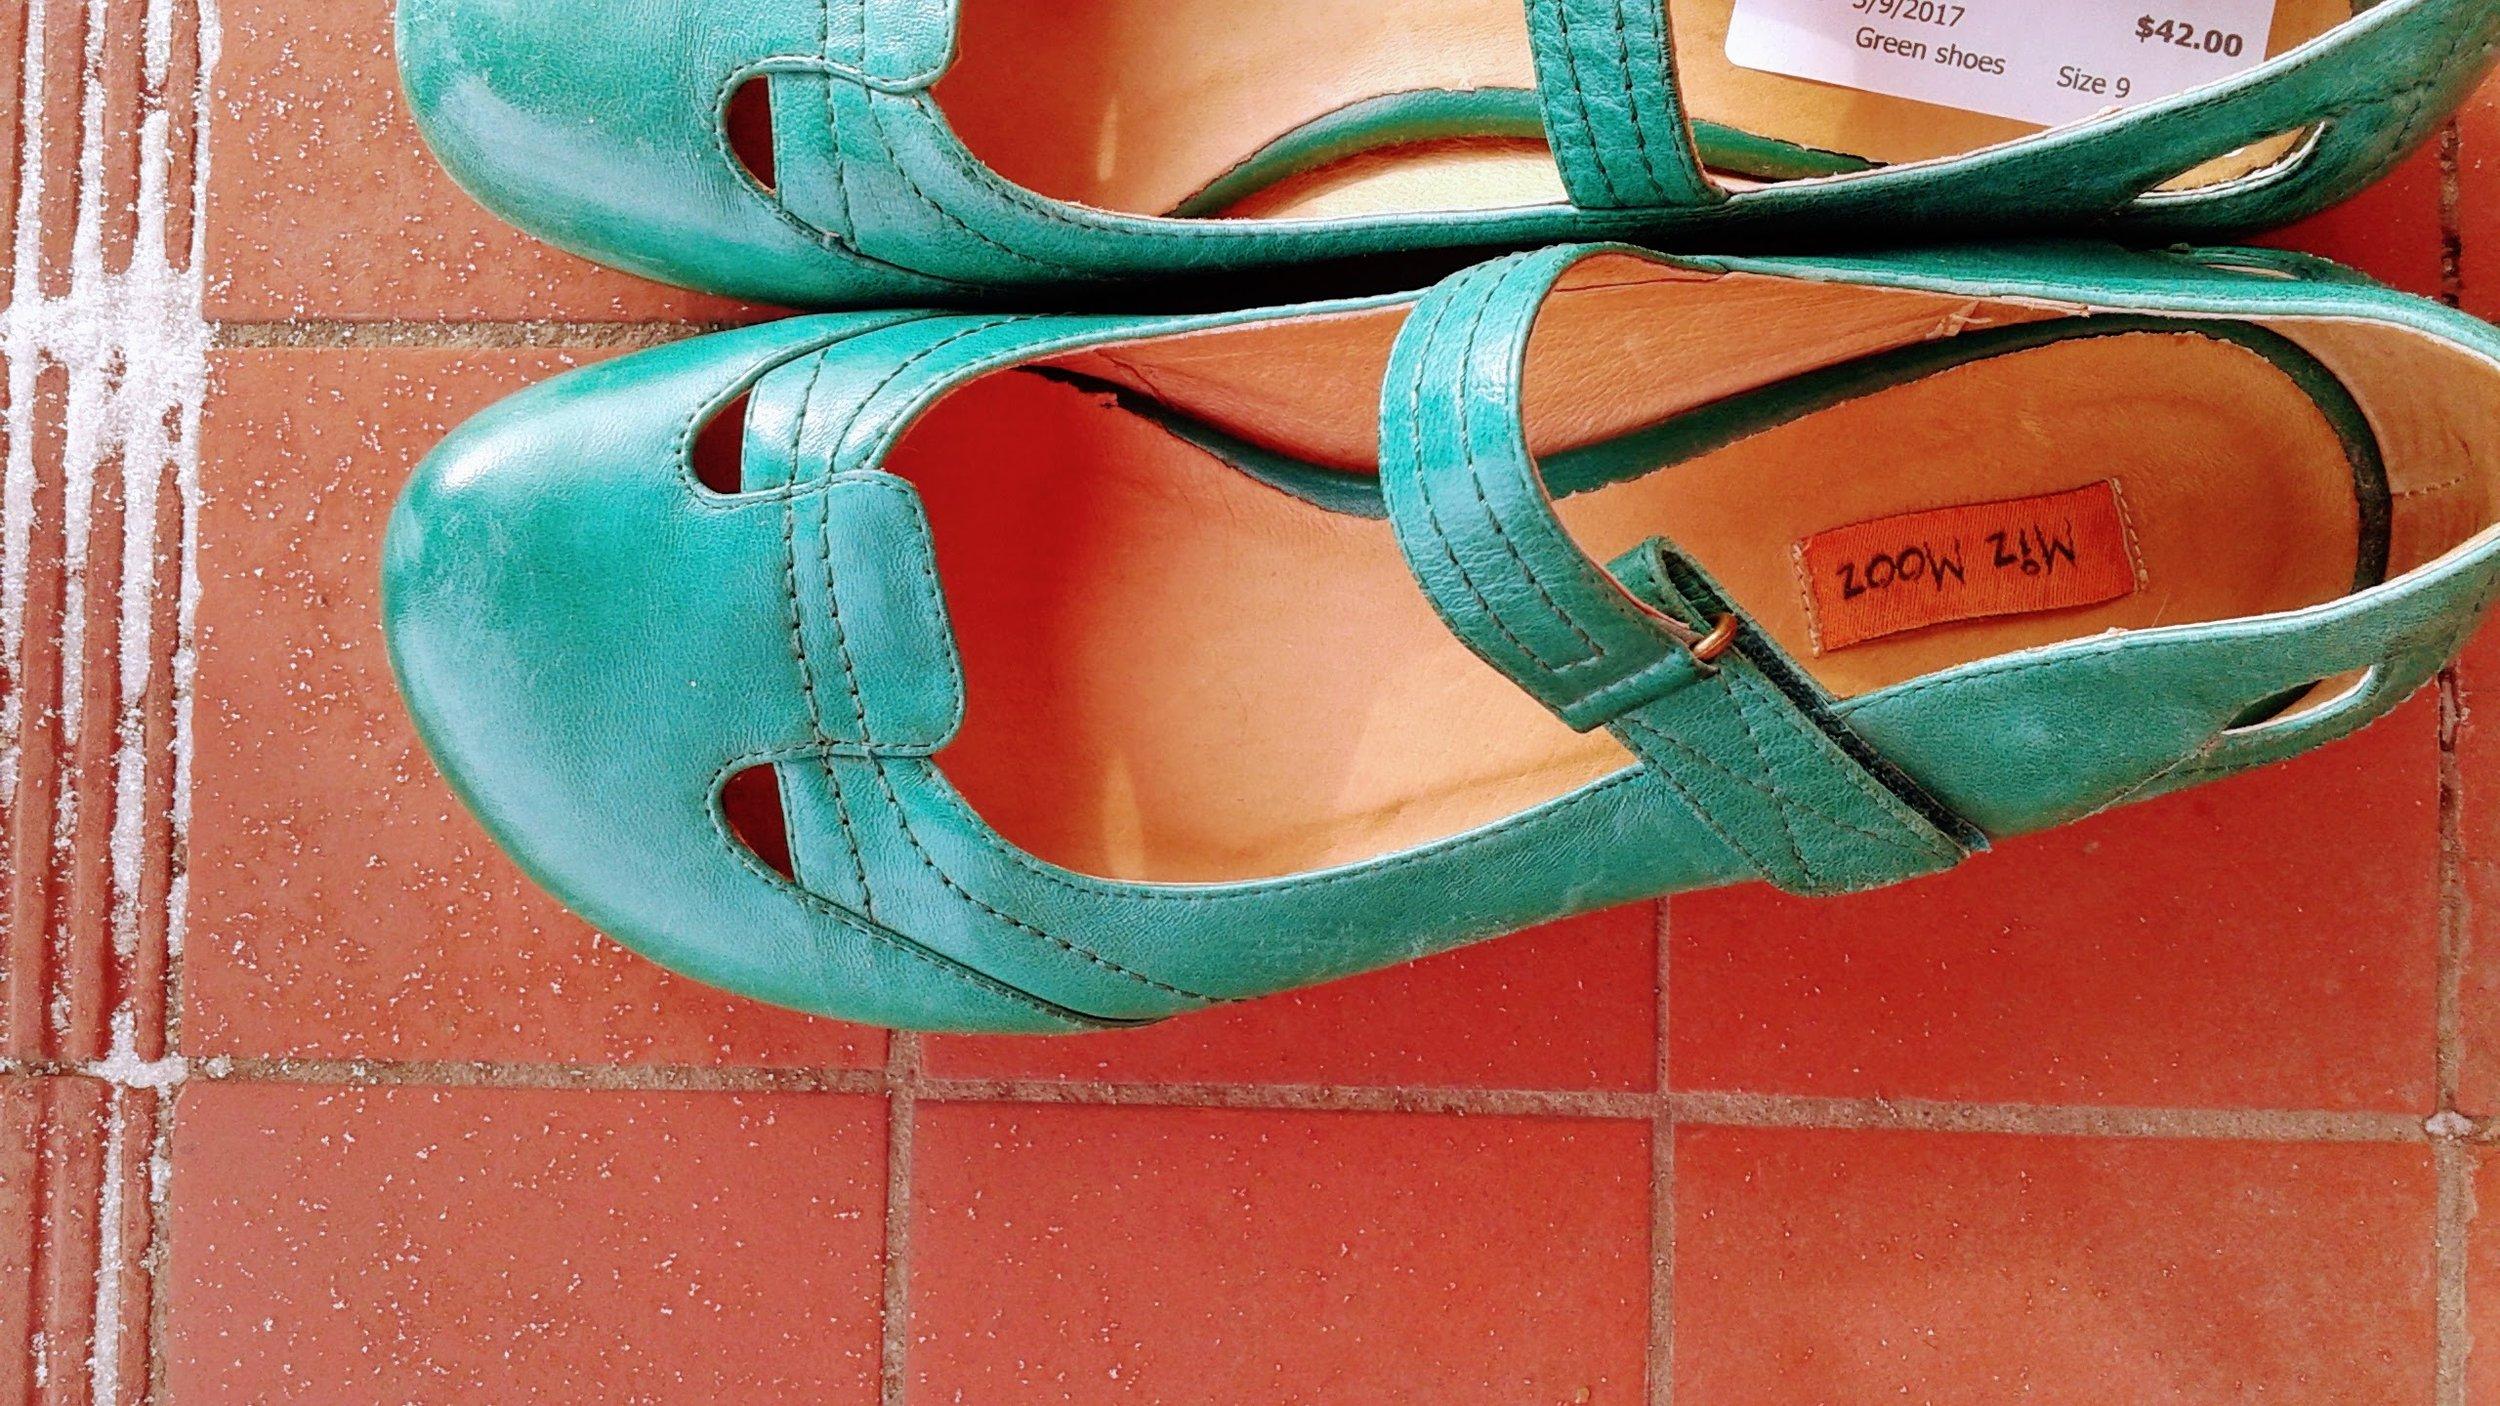 Miz Mooz shoes; S9, $42